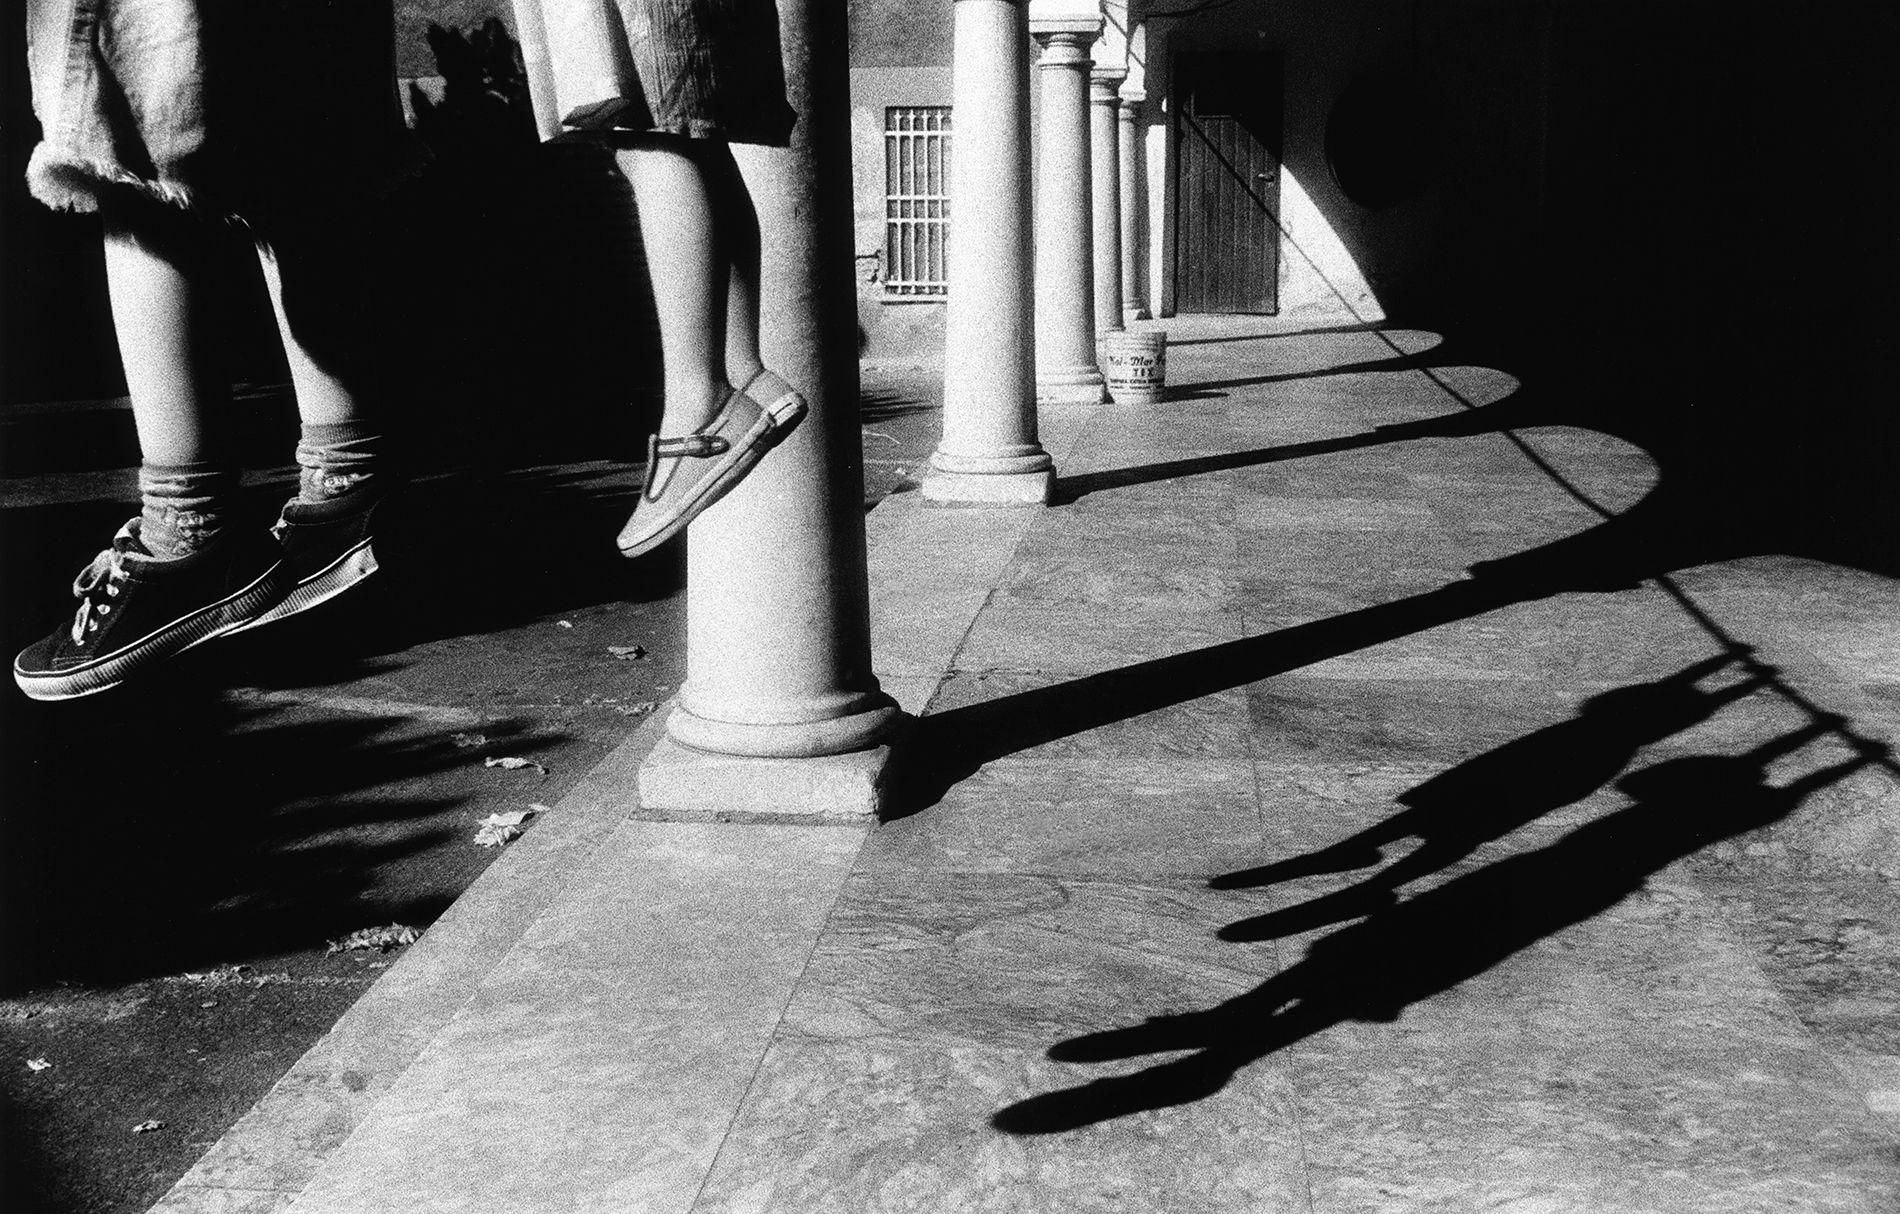 Giochi in ombra